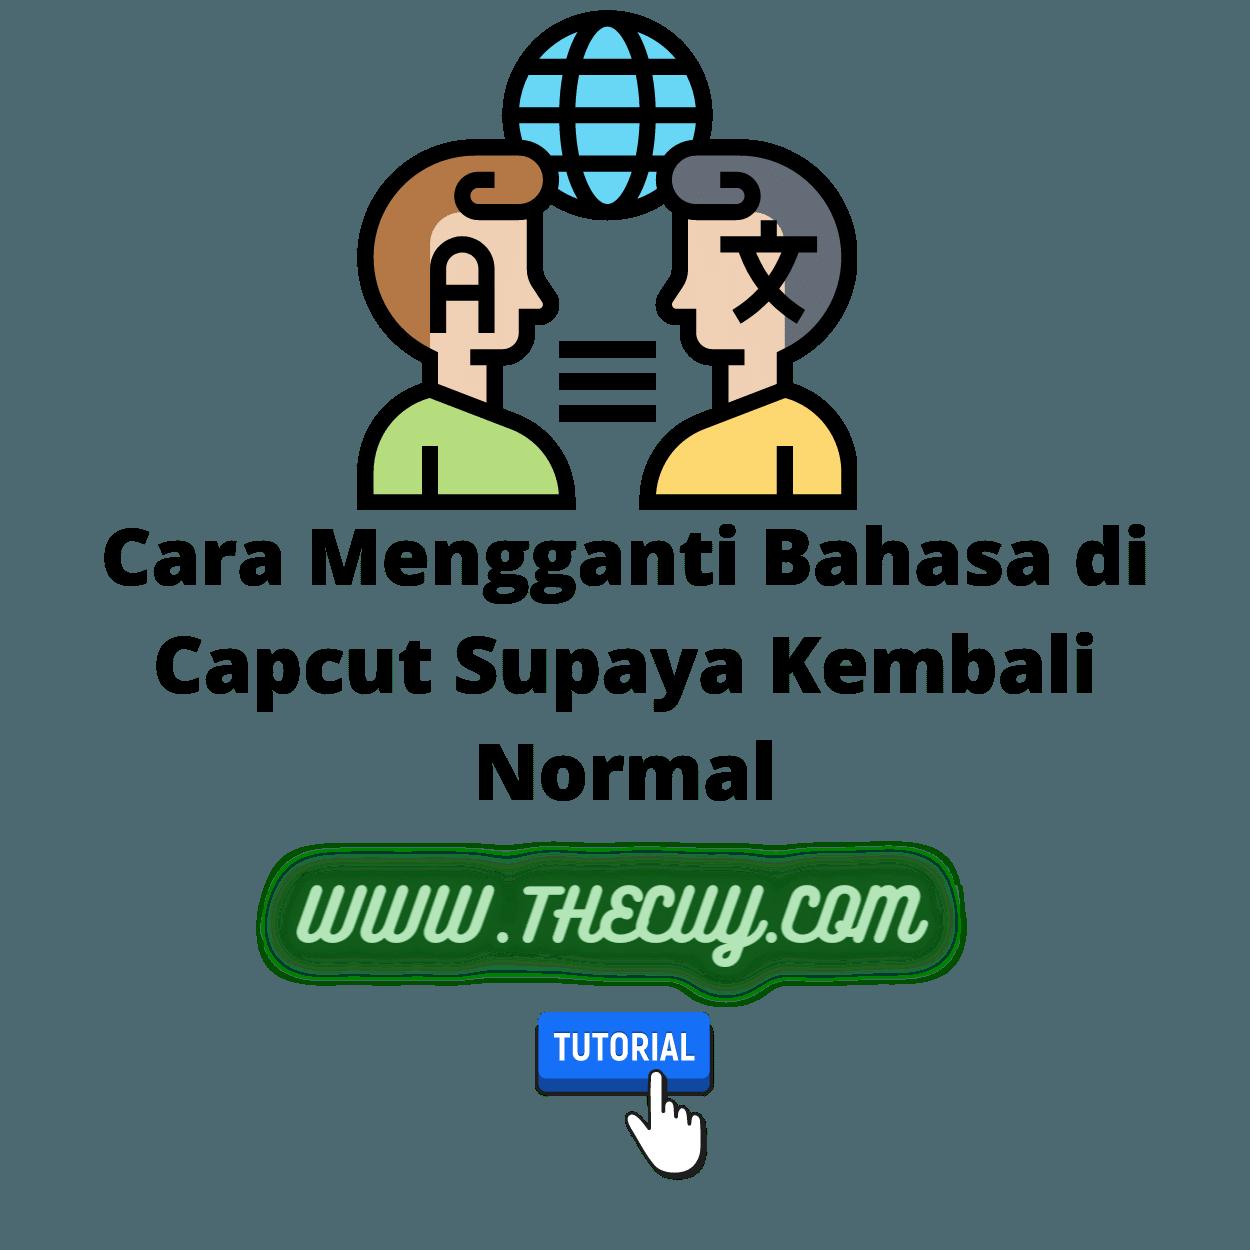 Cara Mengganti Bahasa di Capcut Supaya Kembali Normal